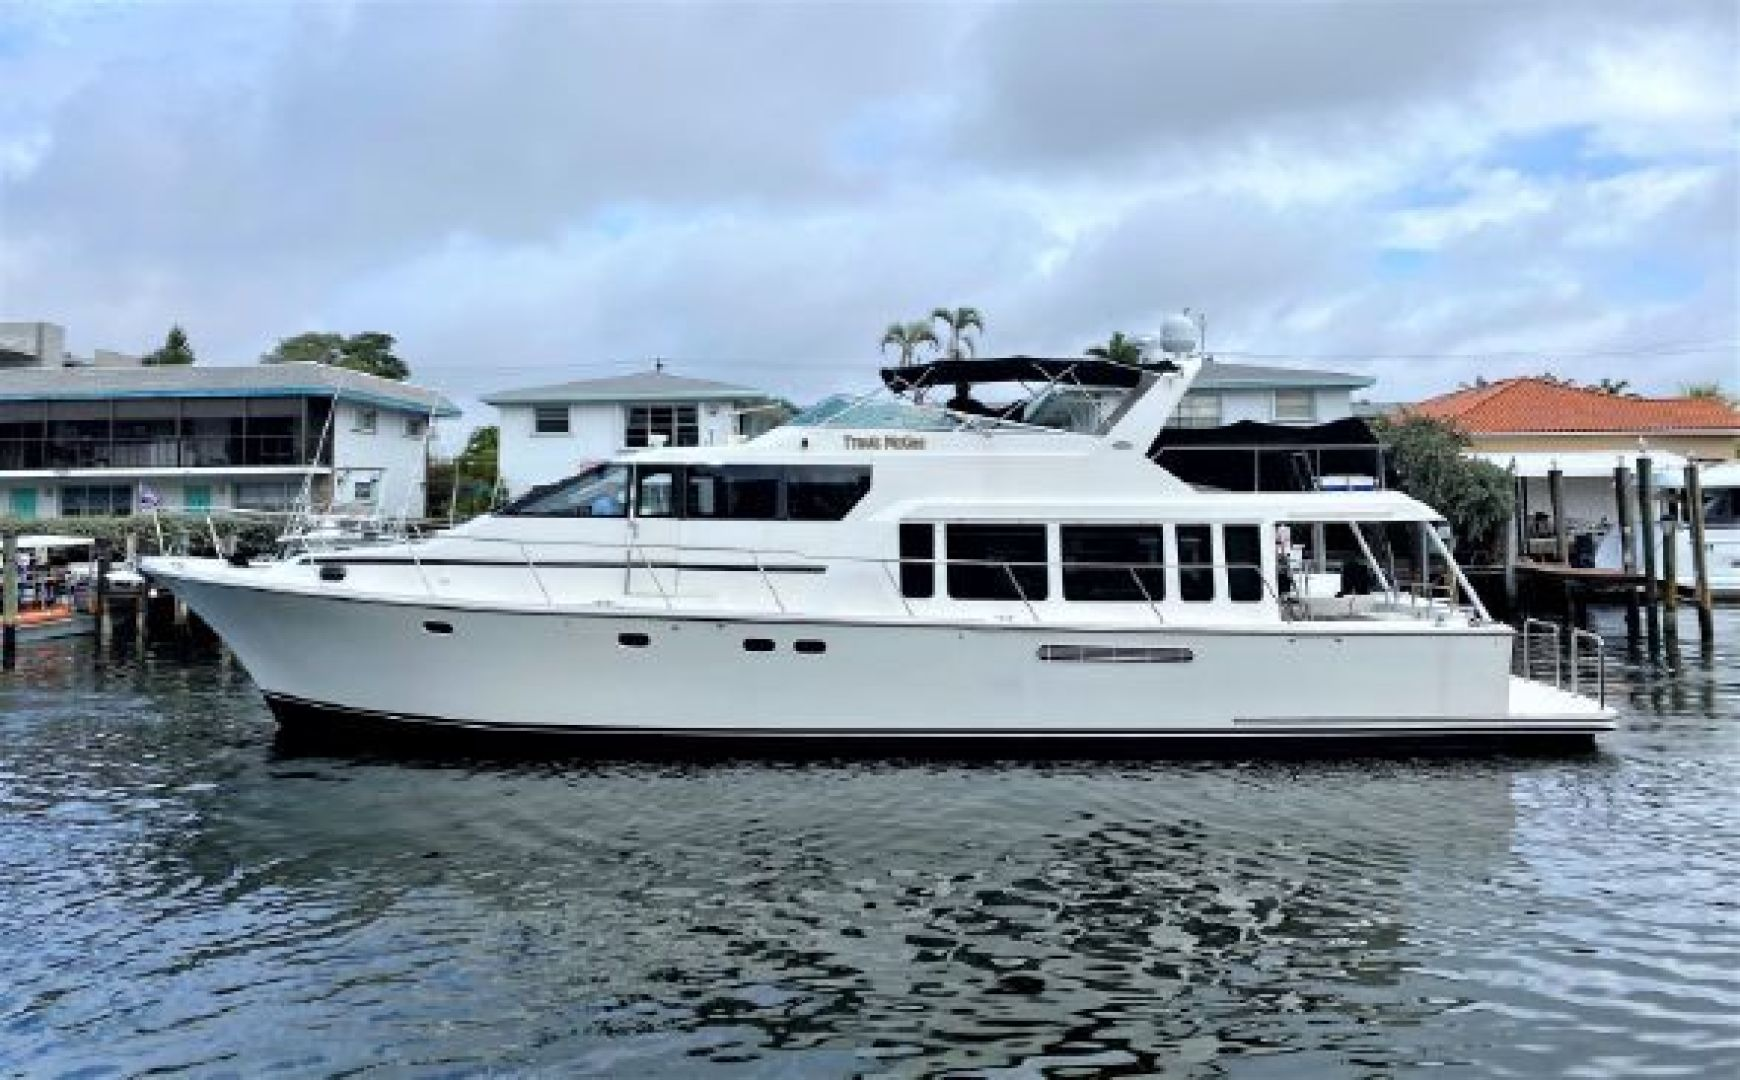 65' Pacific Mariner 2000 Motor Yacht Travis McGee